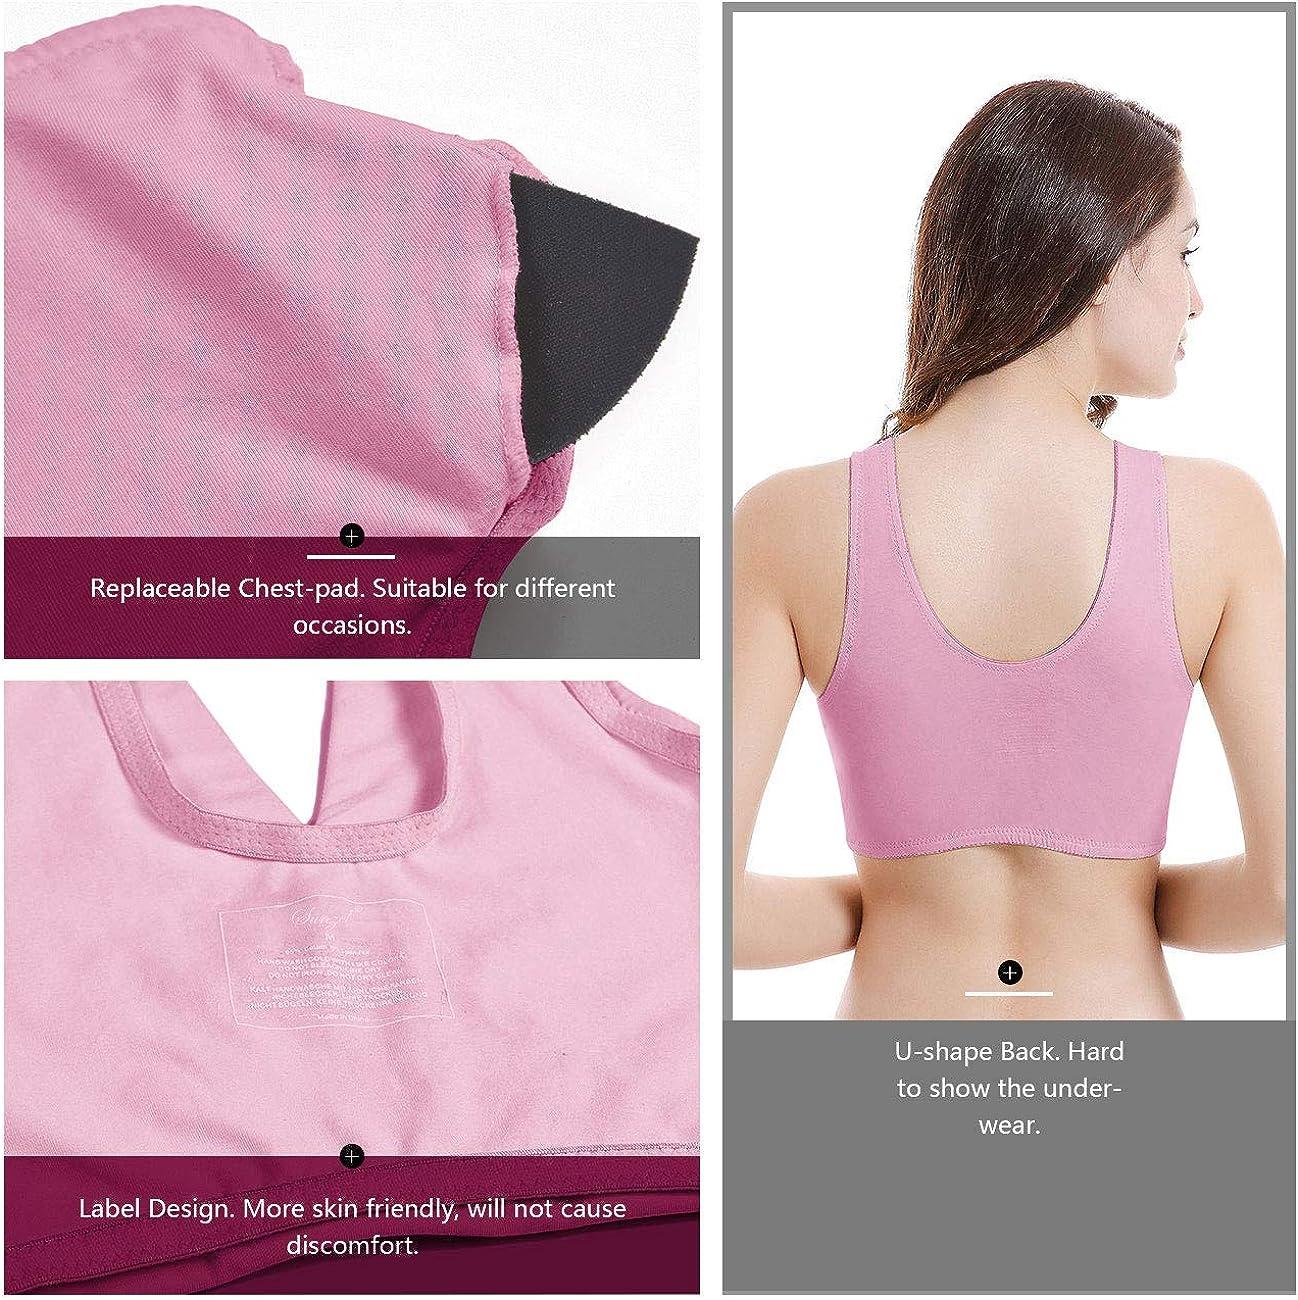 Sunzel Womens Cotton Spandex Seamless Sleep Bra for Nursing and Maternity 2019 Upgraded Version